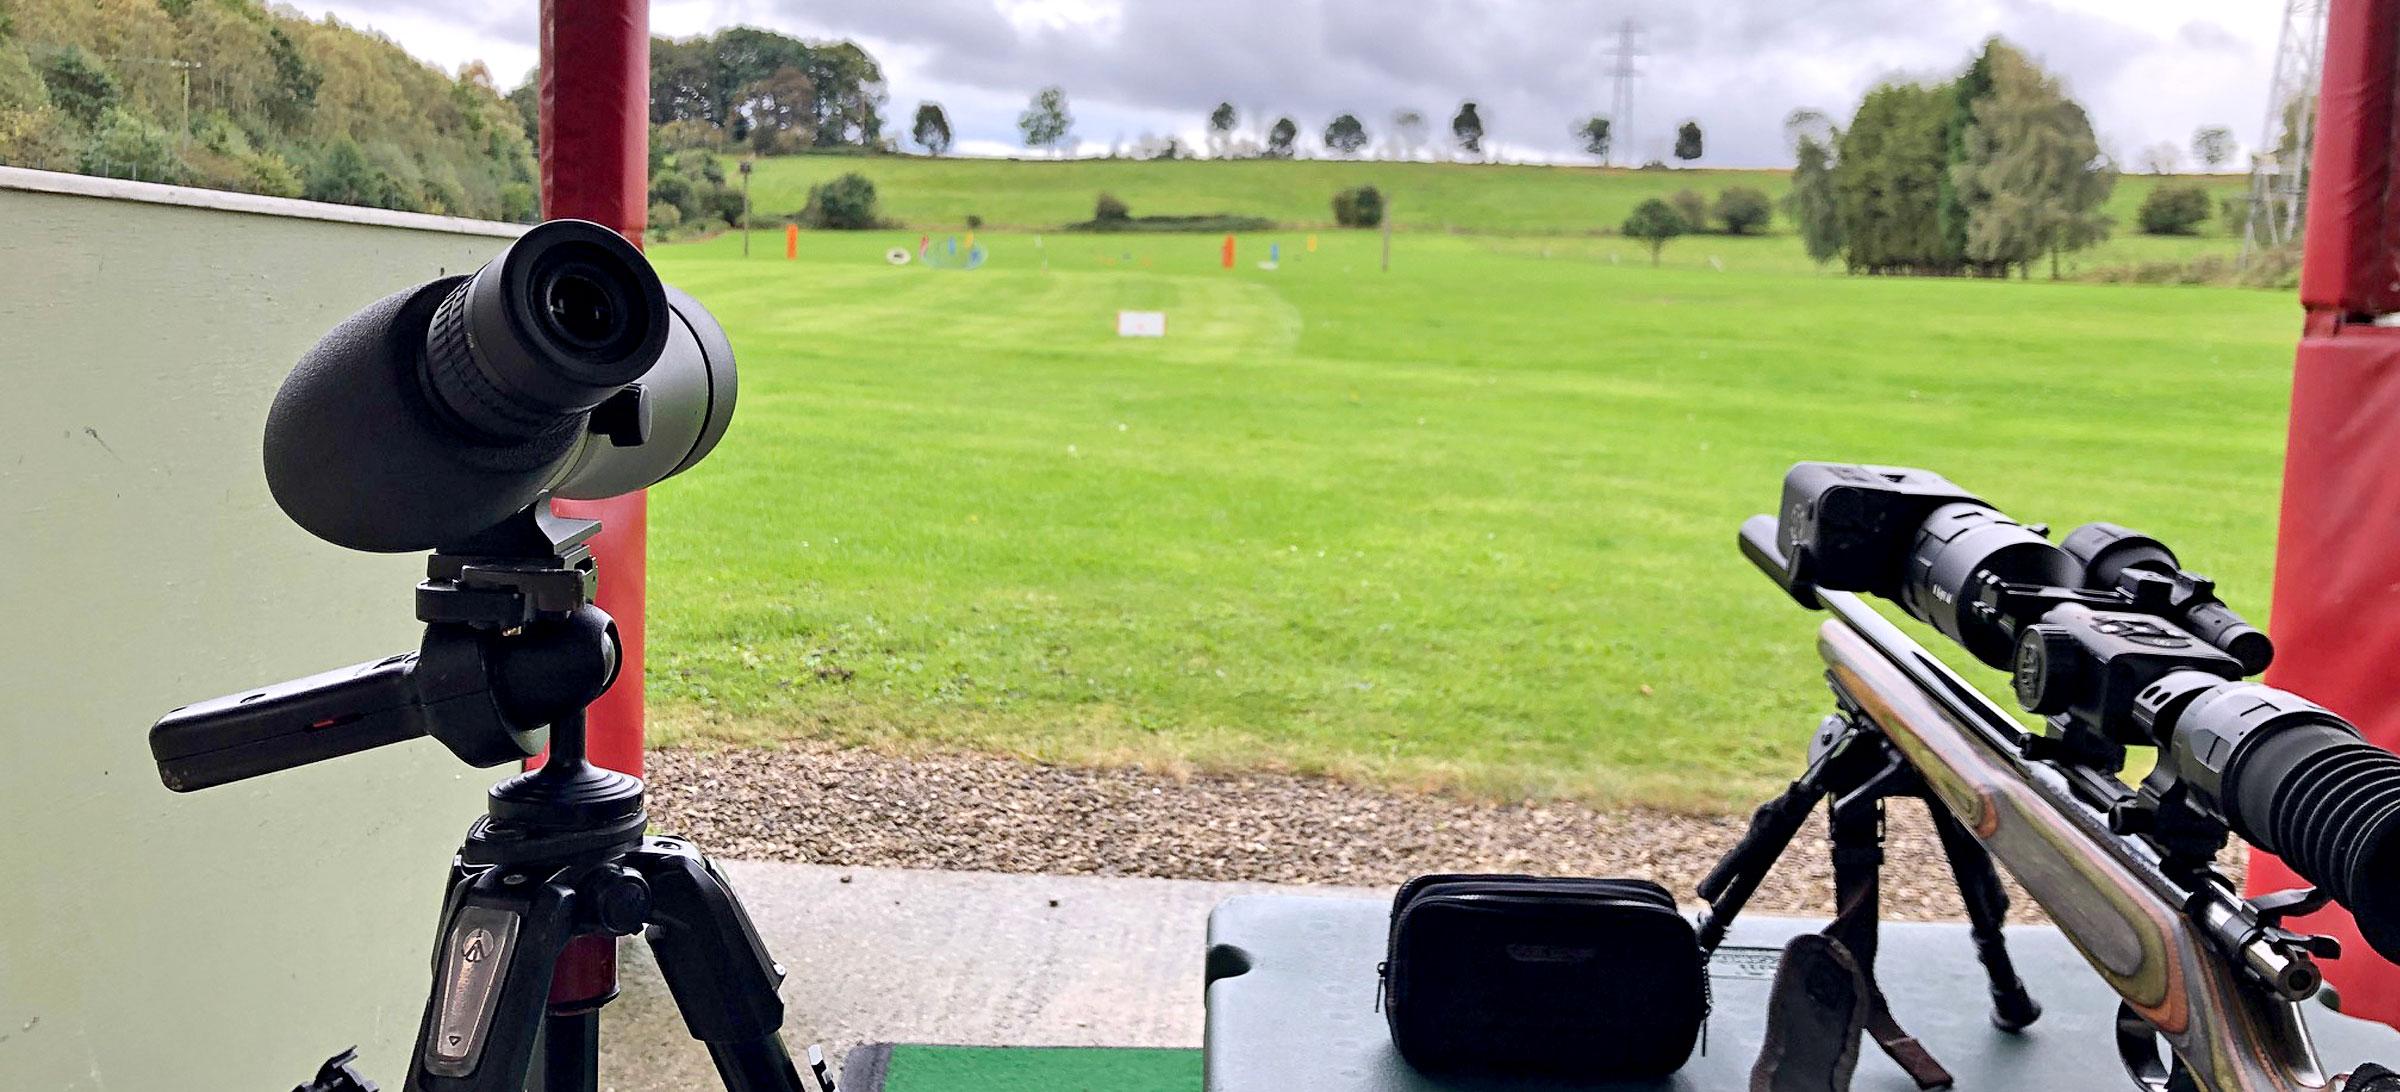 Using a Spotting Scope for Long Range Shooting